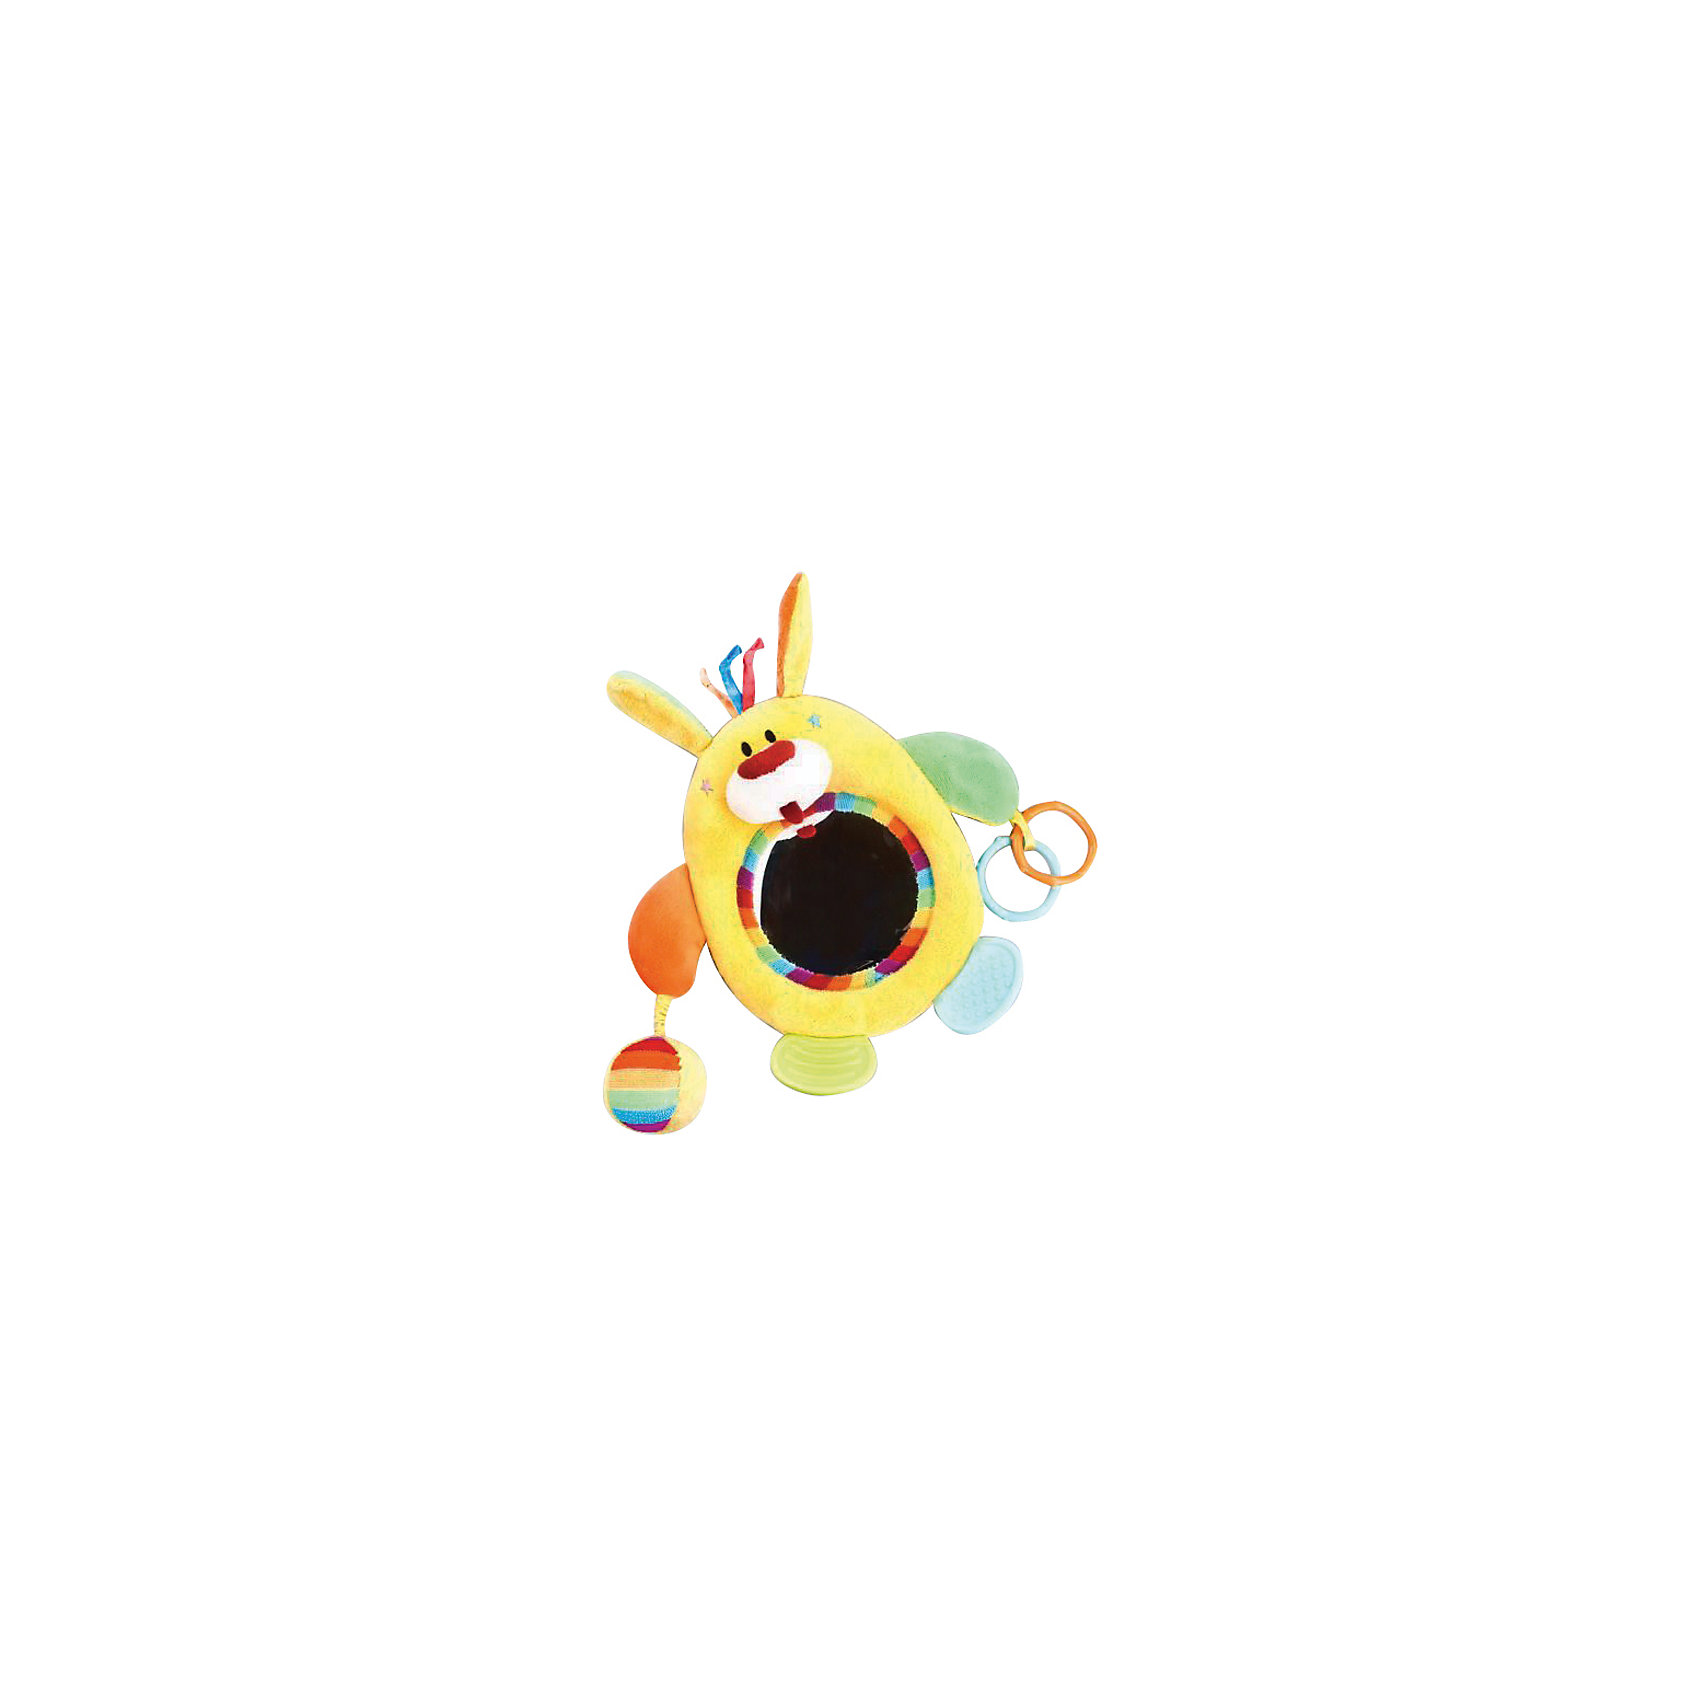 Жирафики Развивающая игрушка Зайка, Жирафики жирафики развивающая игрушка зайка жирафики